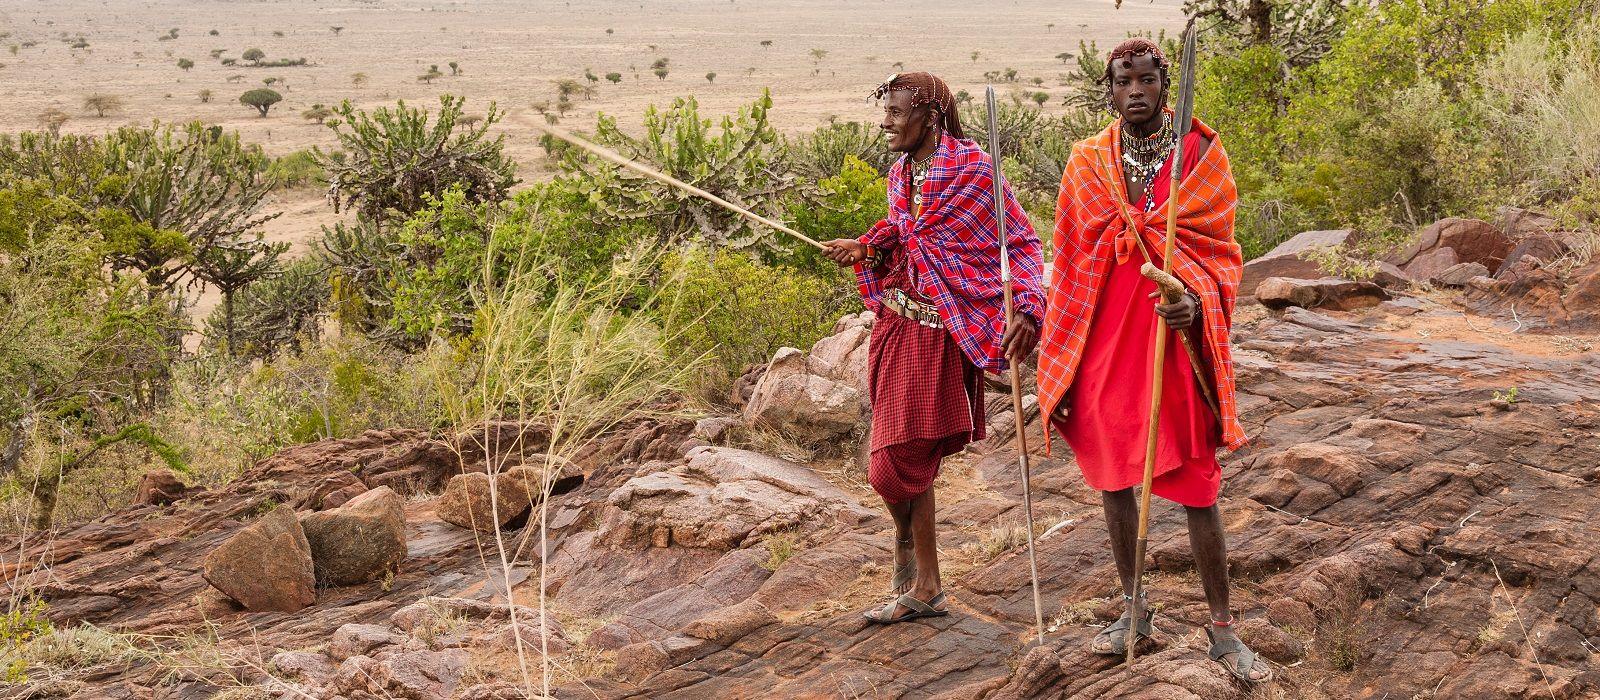 Atua Enkop Exklusiv: Kenia Safari und Strandurlaub Urlaub 5